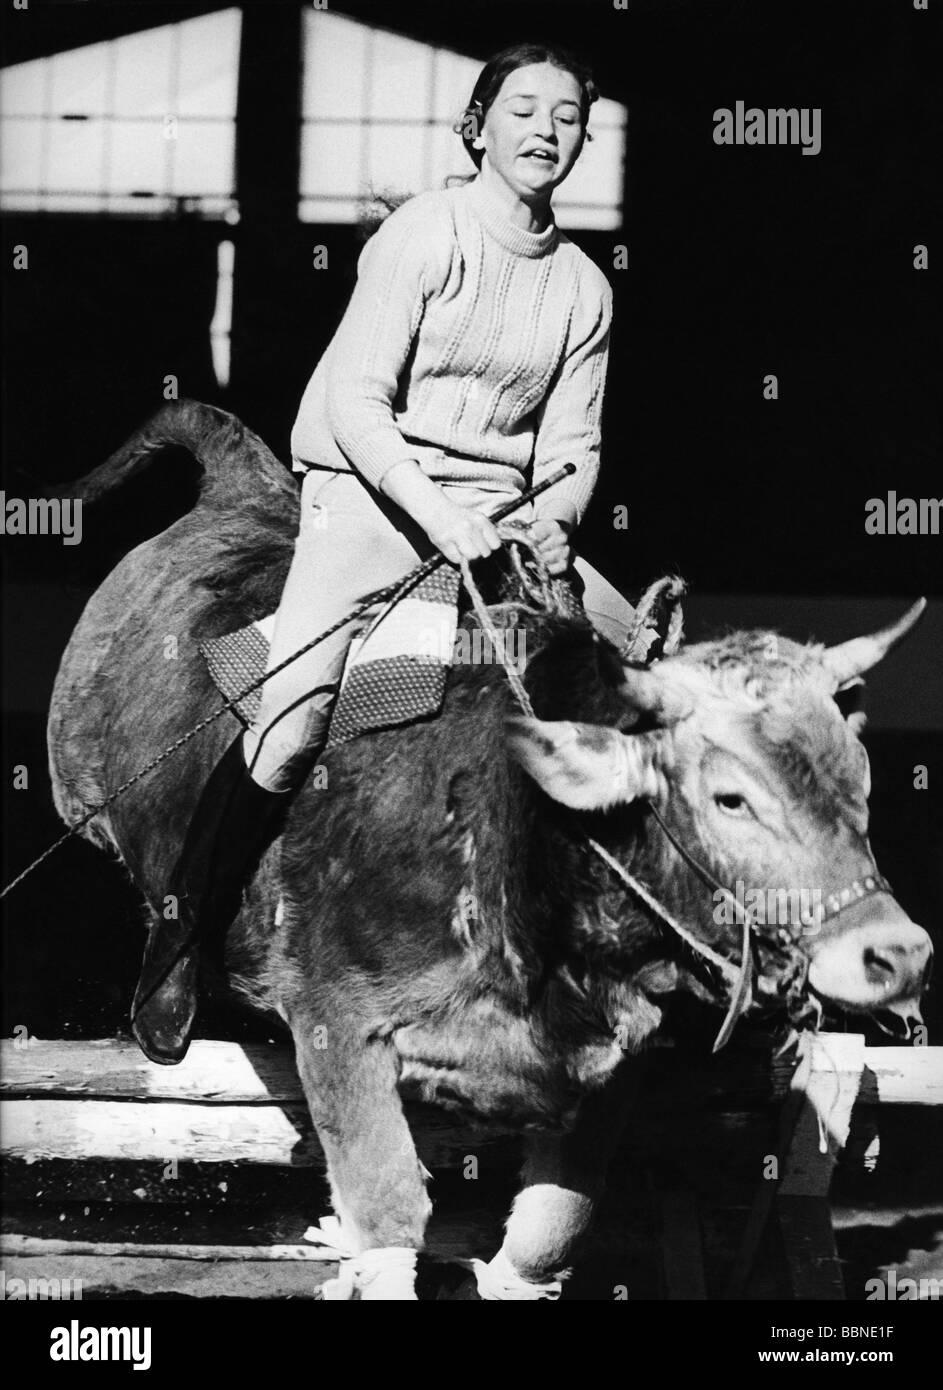 oddity, woman riding on bull, cow, cows, bulls, women, people, curiosity, curiosities, oddities, 20th century, historic, - Stock Image